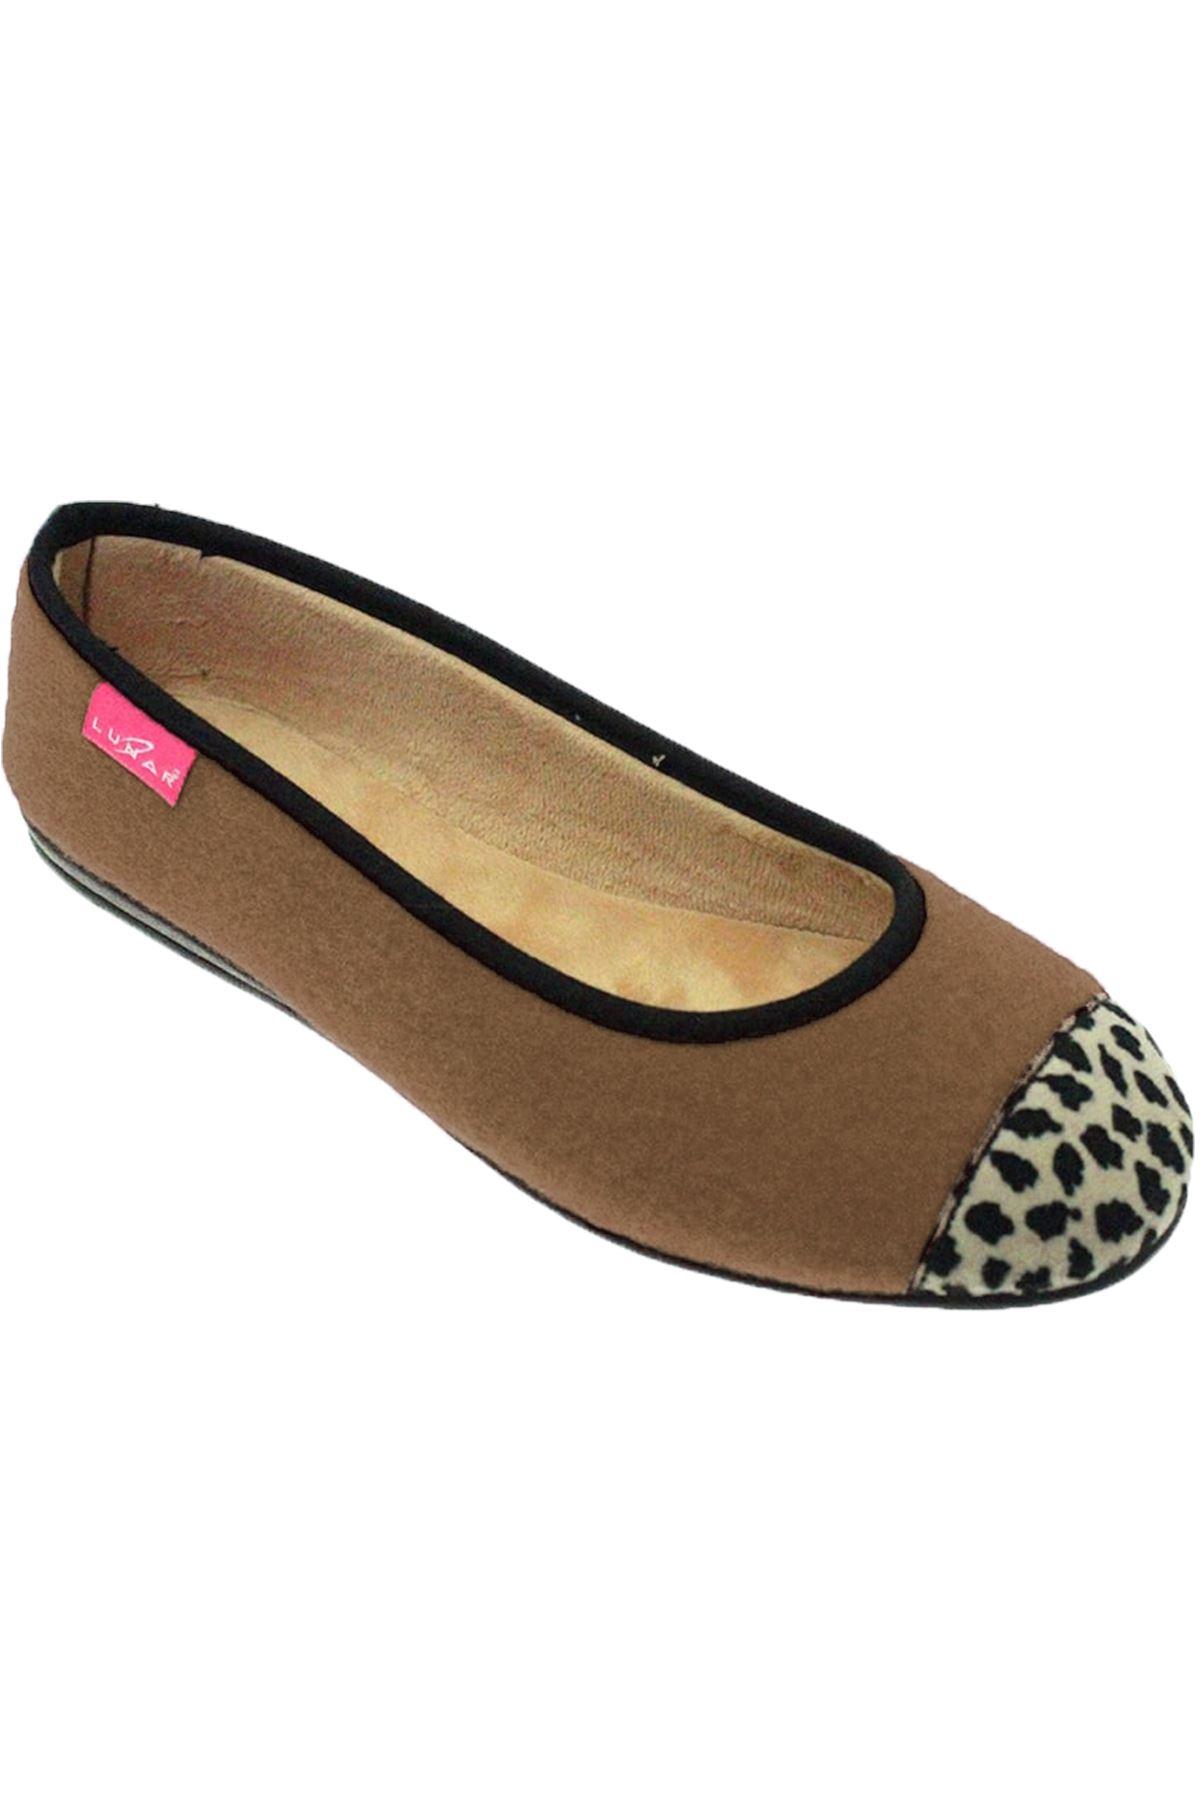 KLA042 Denise II Leopard Print Super Soft Slip On Pump Outdoor Style Slipper